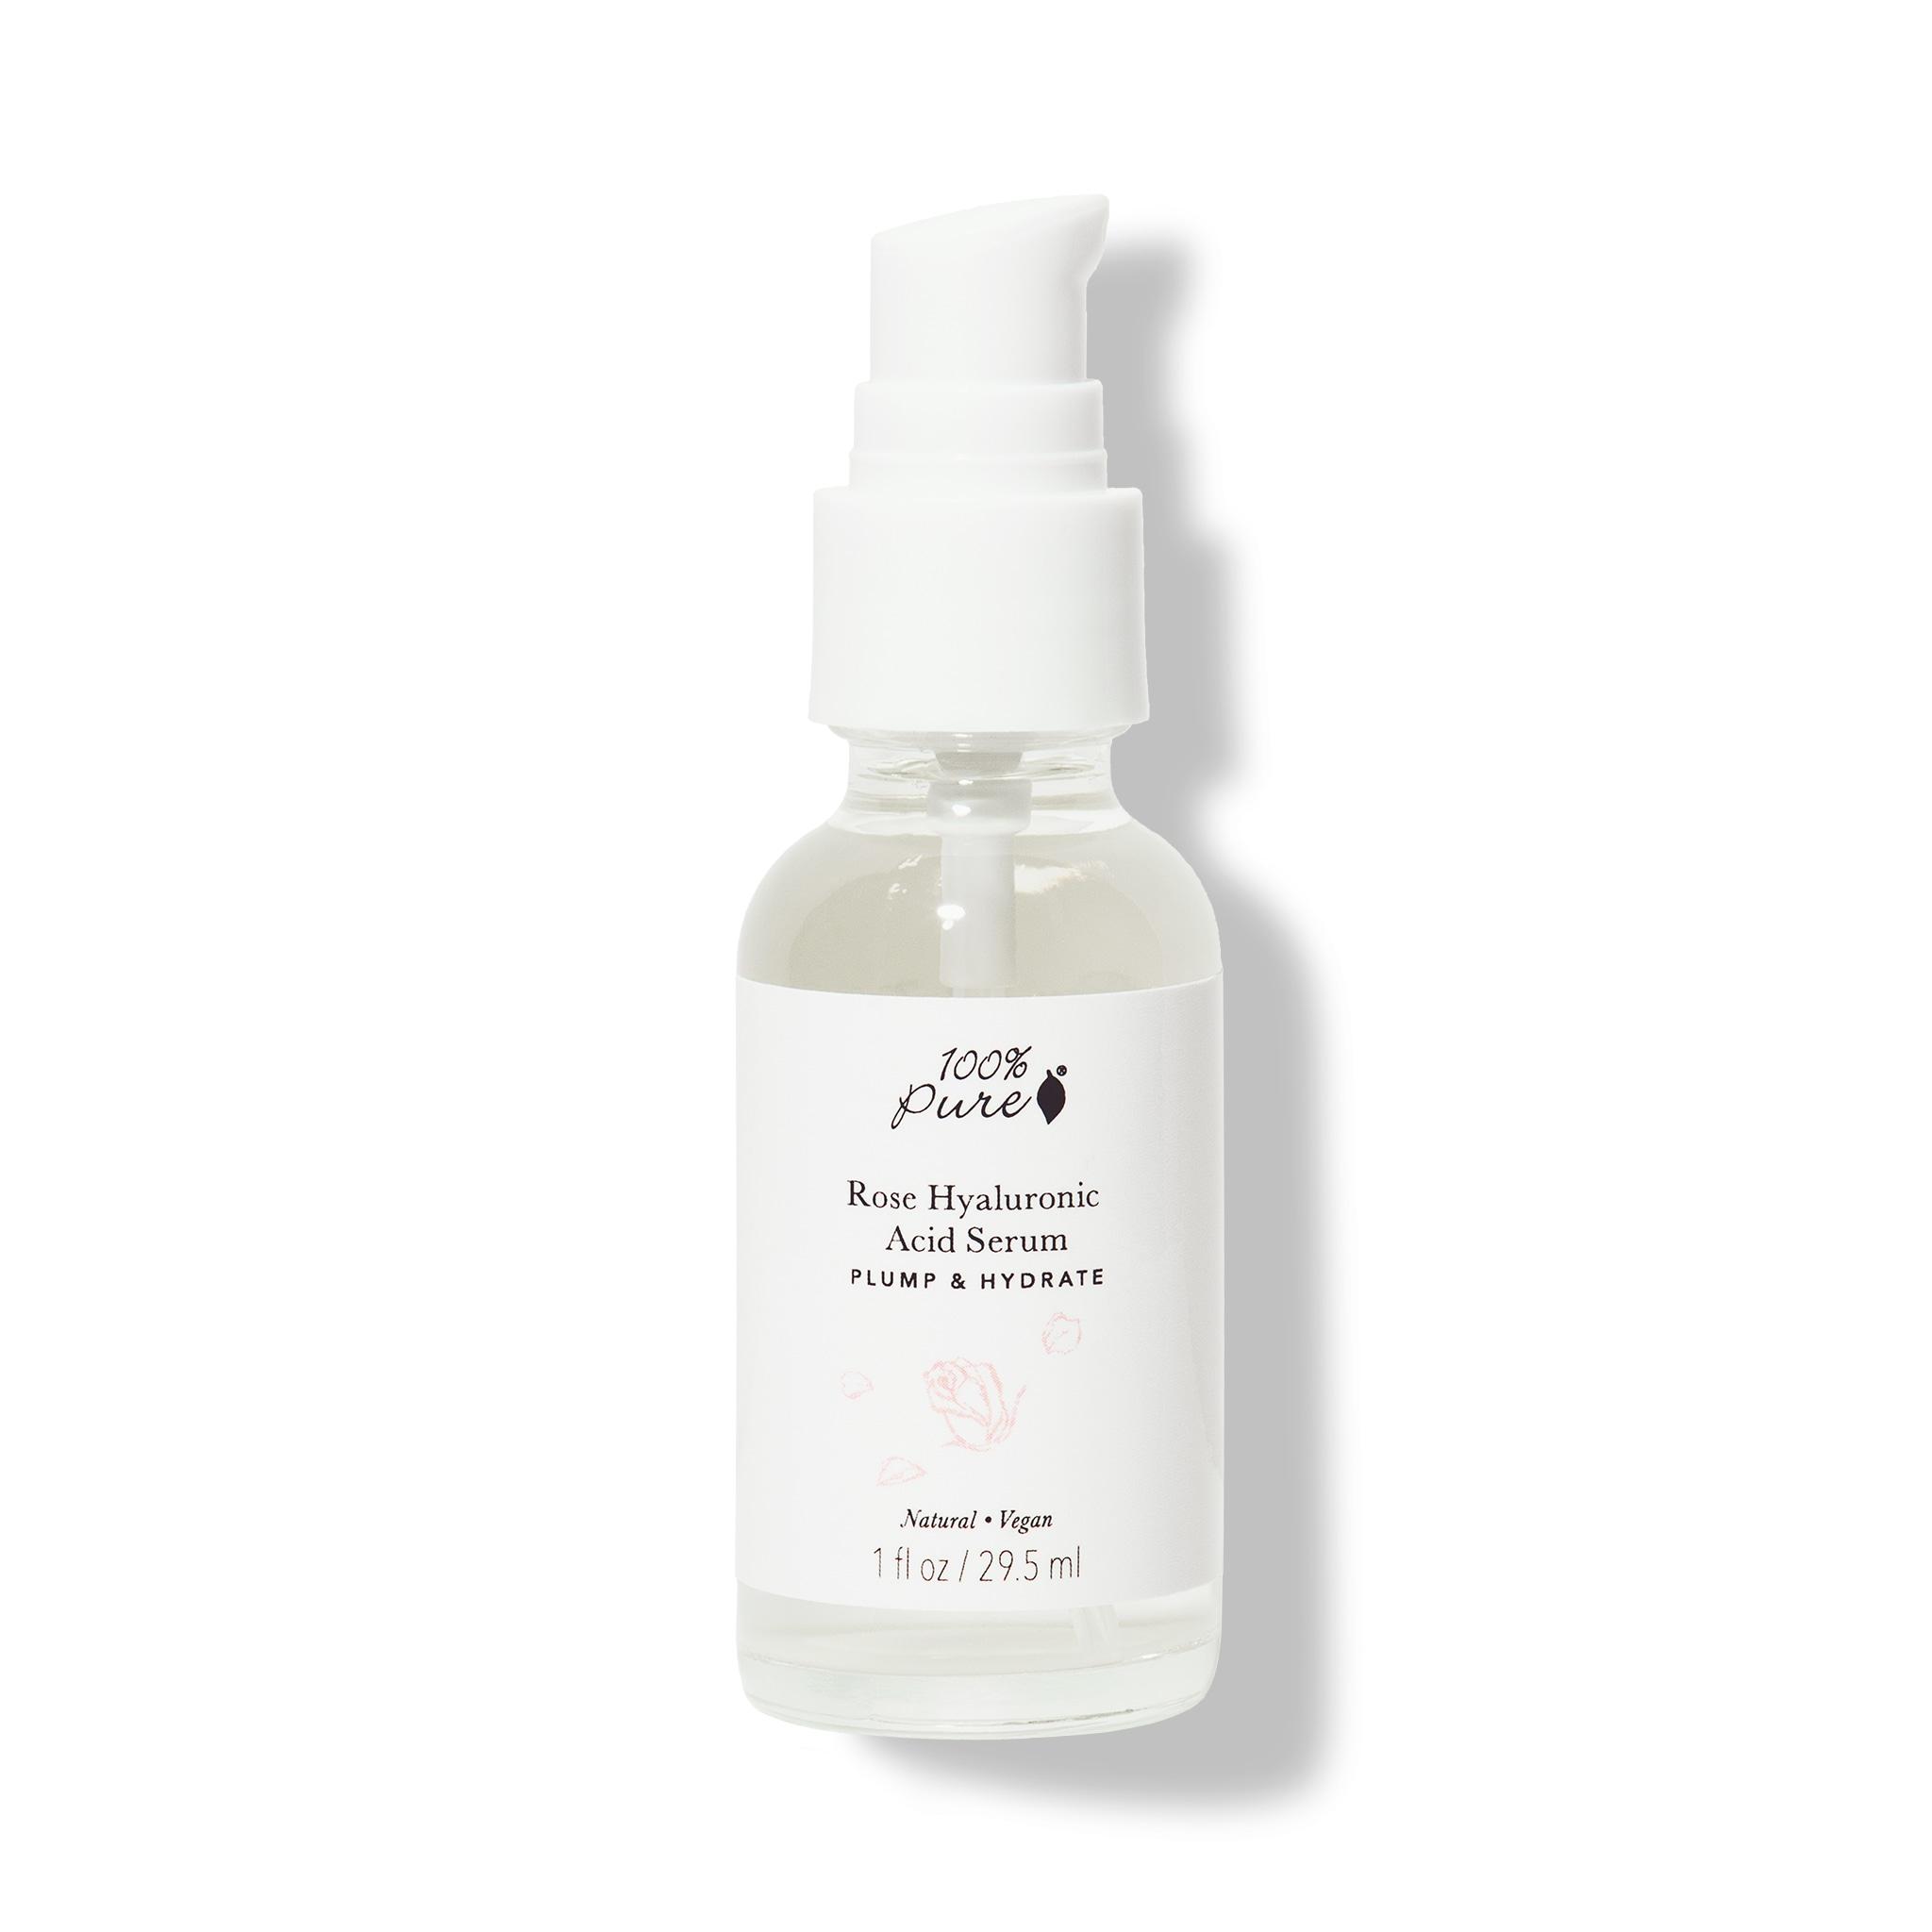 Product Grid - Rose Hyaluronic Acid Serum